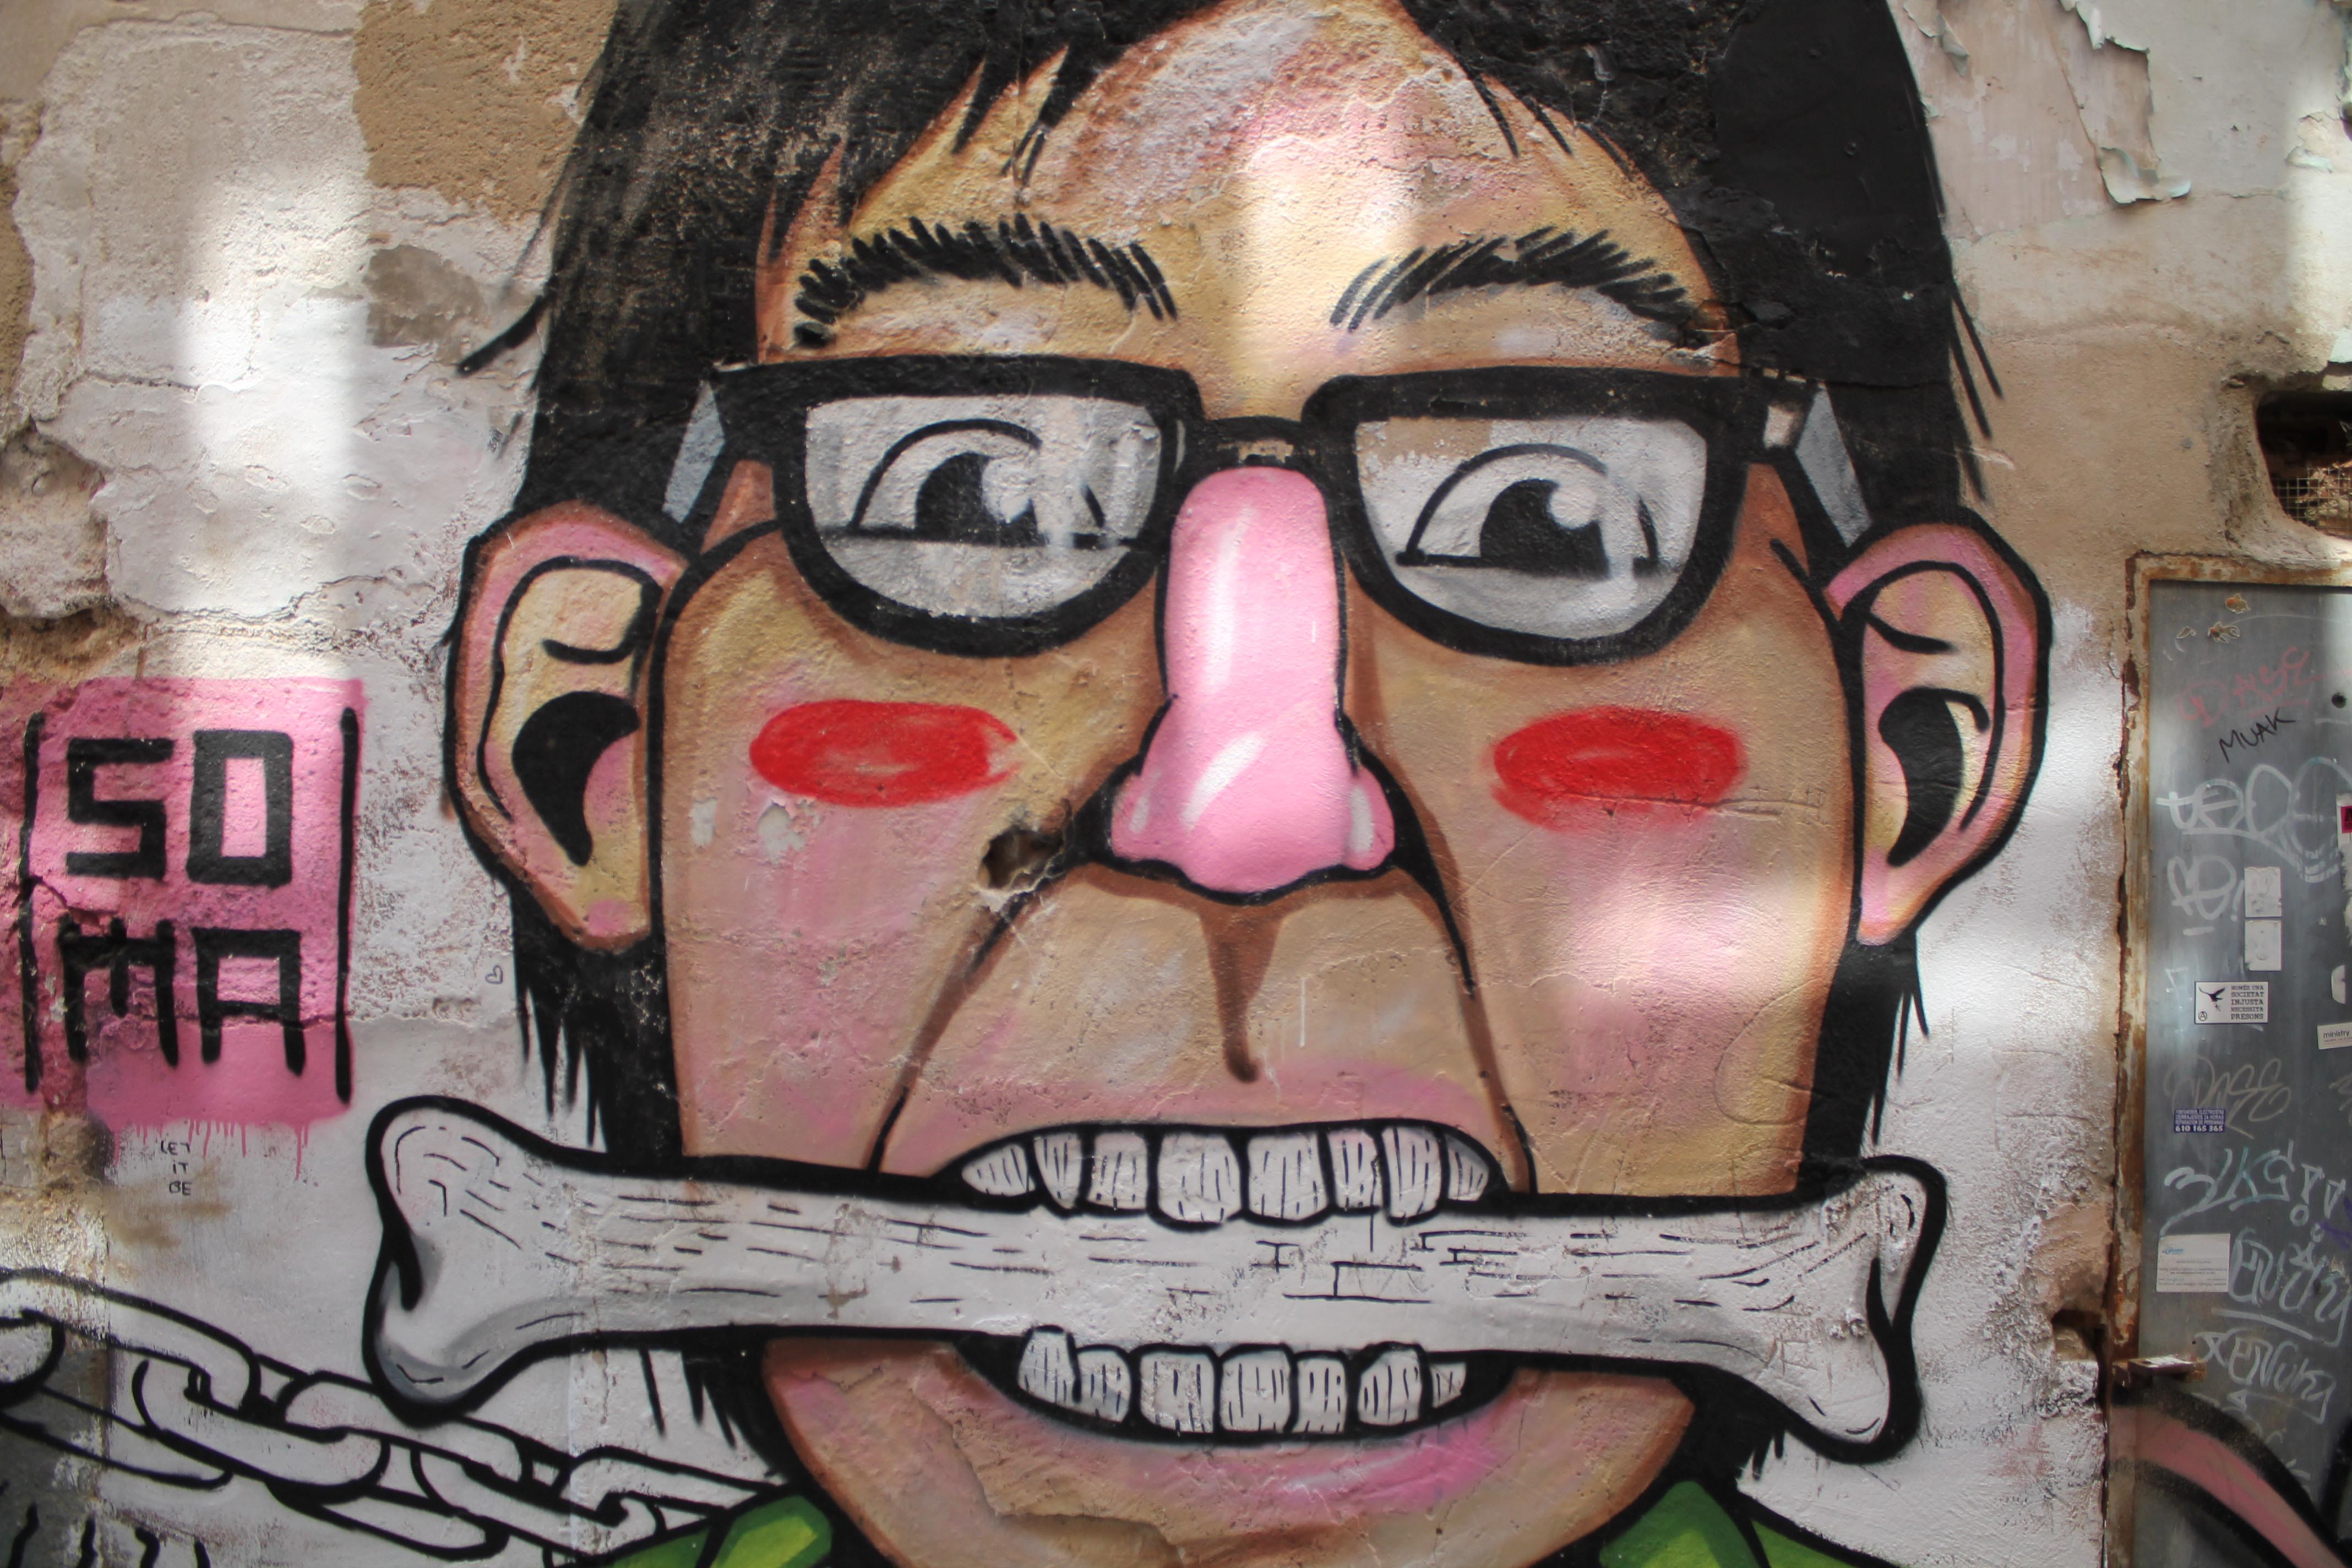 Somas Street Art